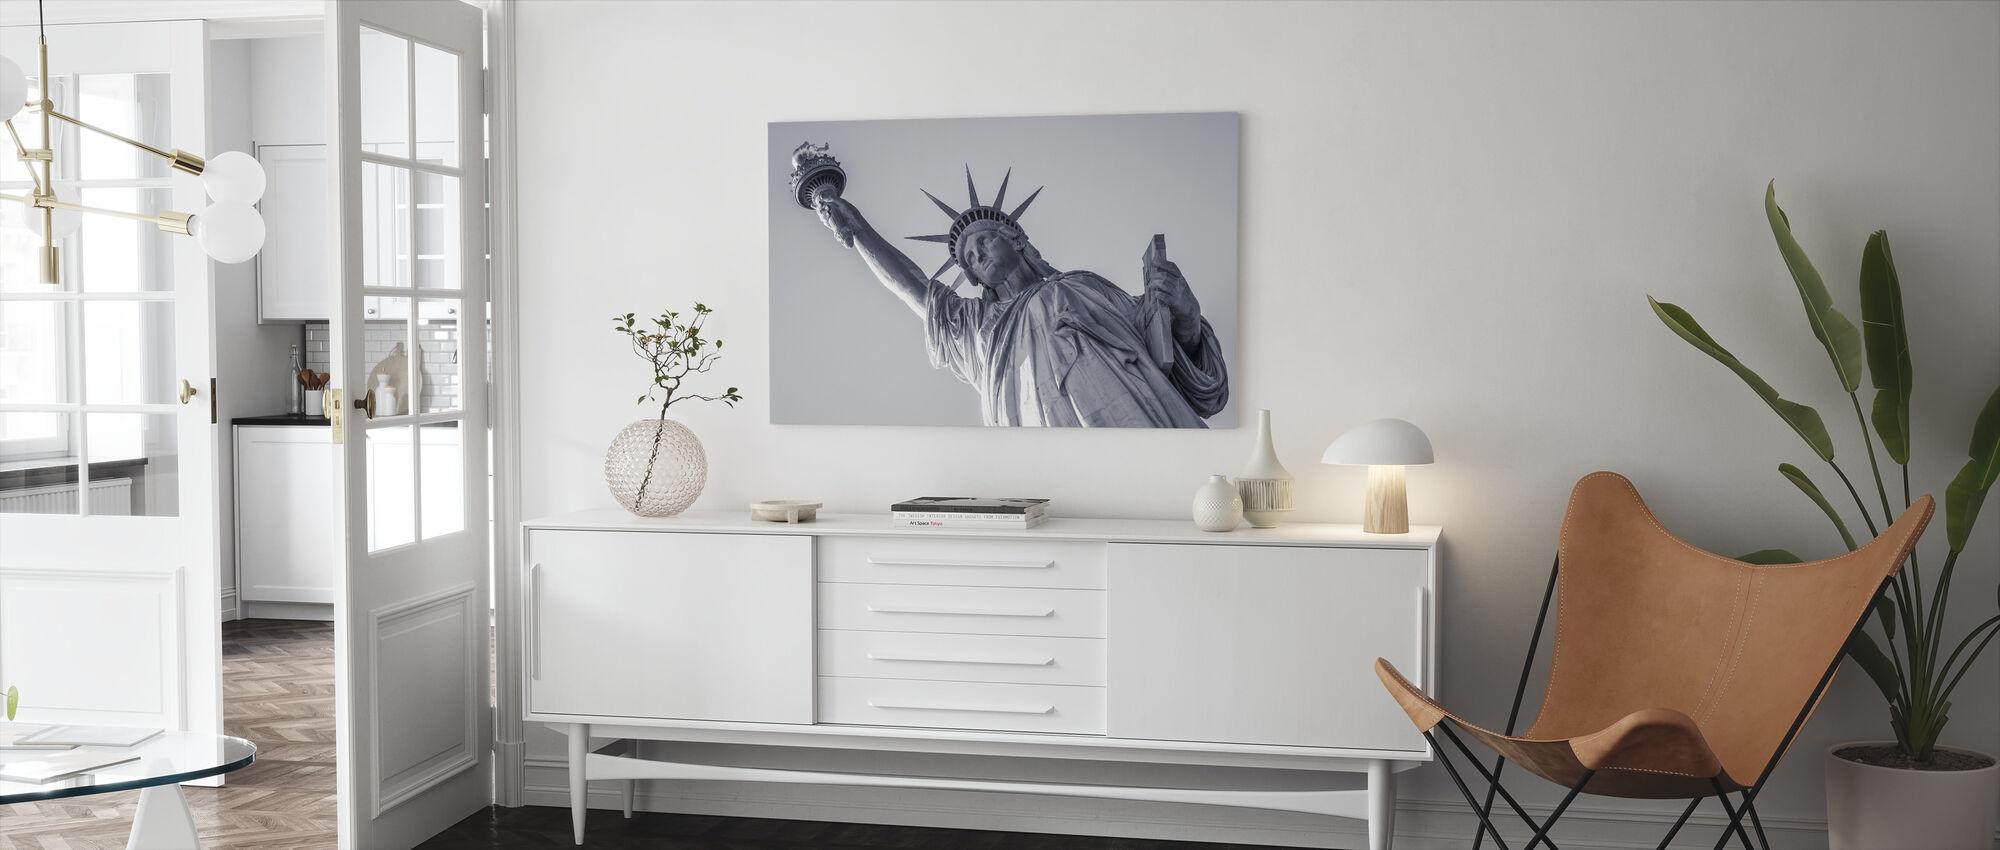 Statue of Liberty - Canvas print - Living Room